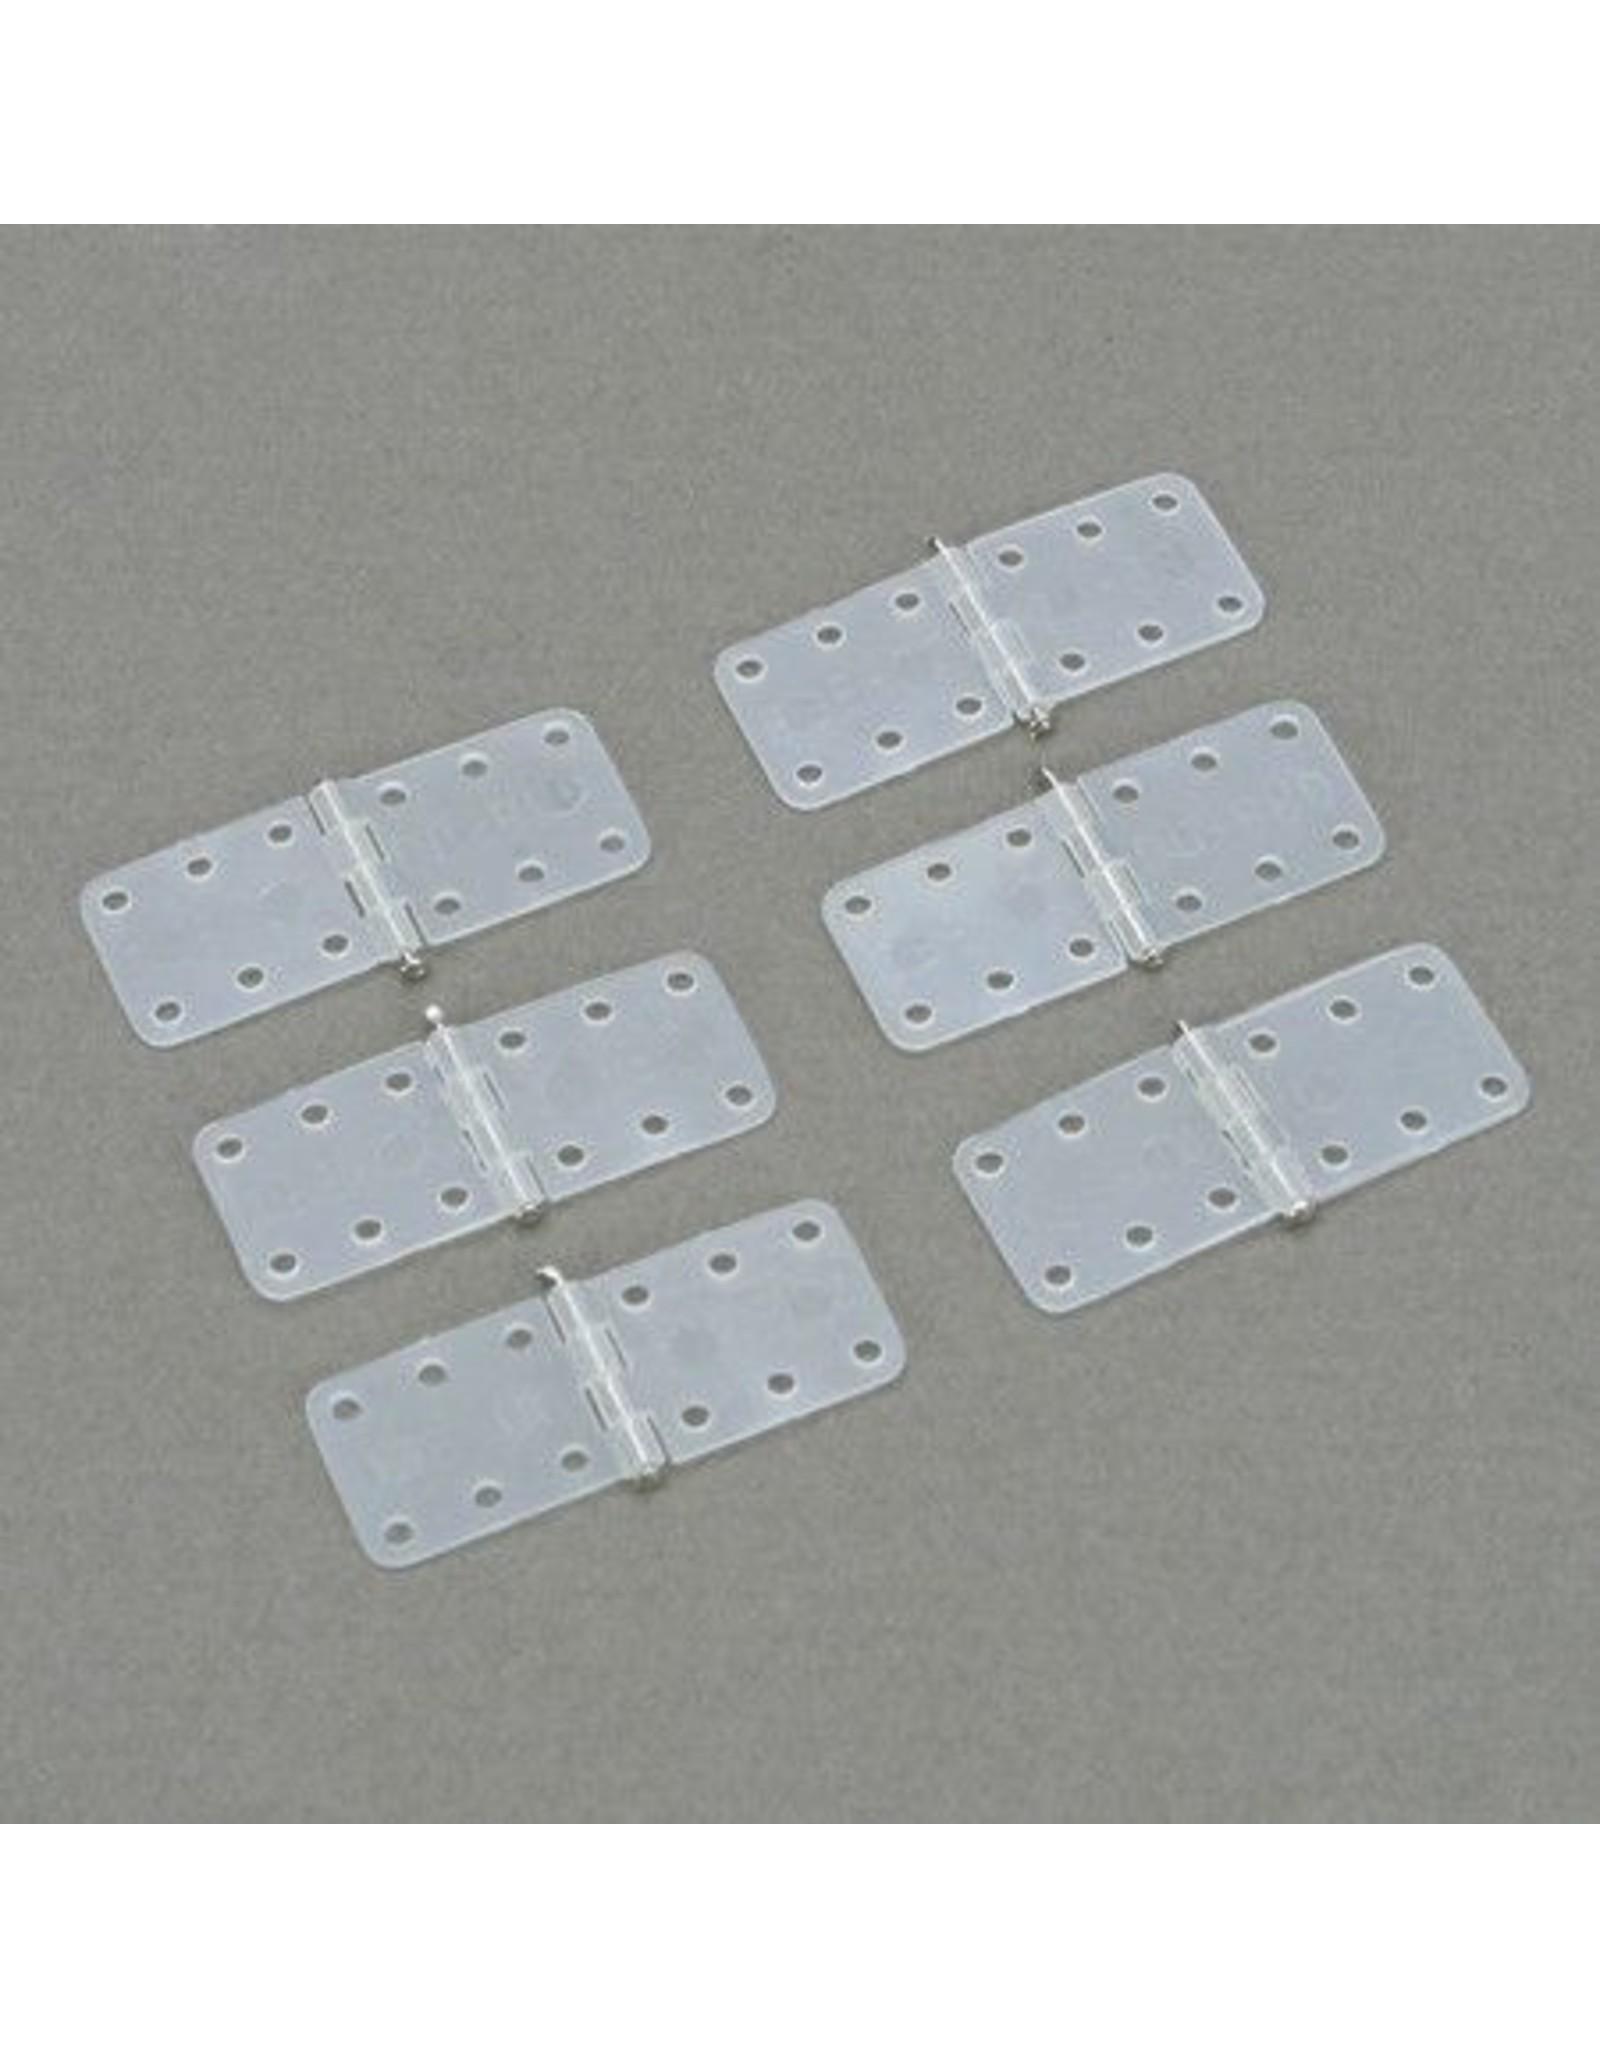 Dubro 118 - Nylon Hinge - Small (6)